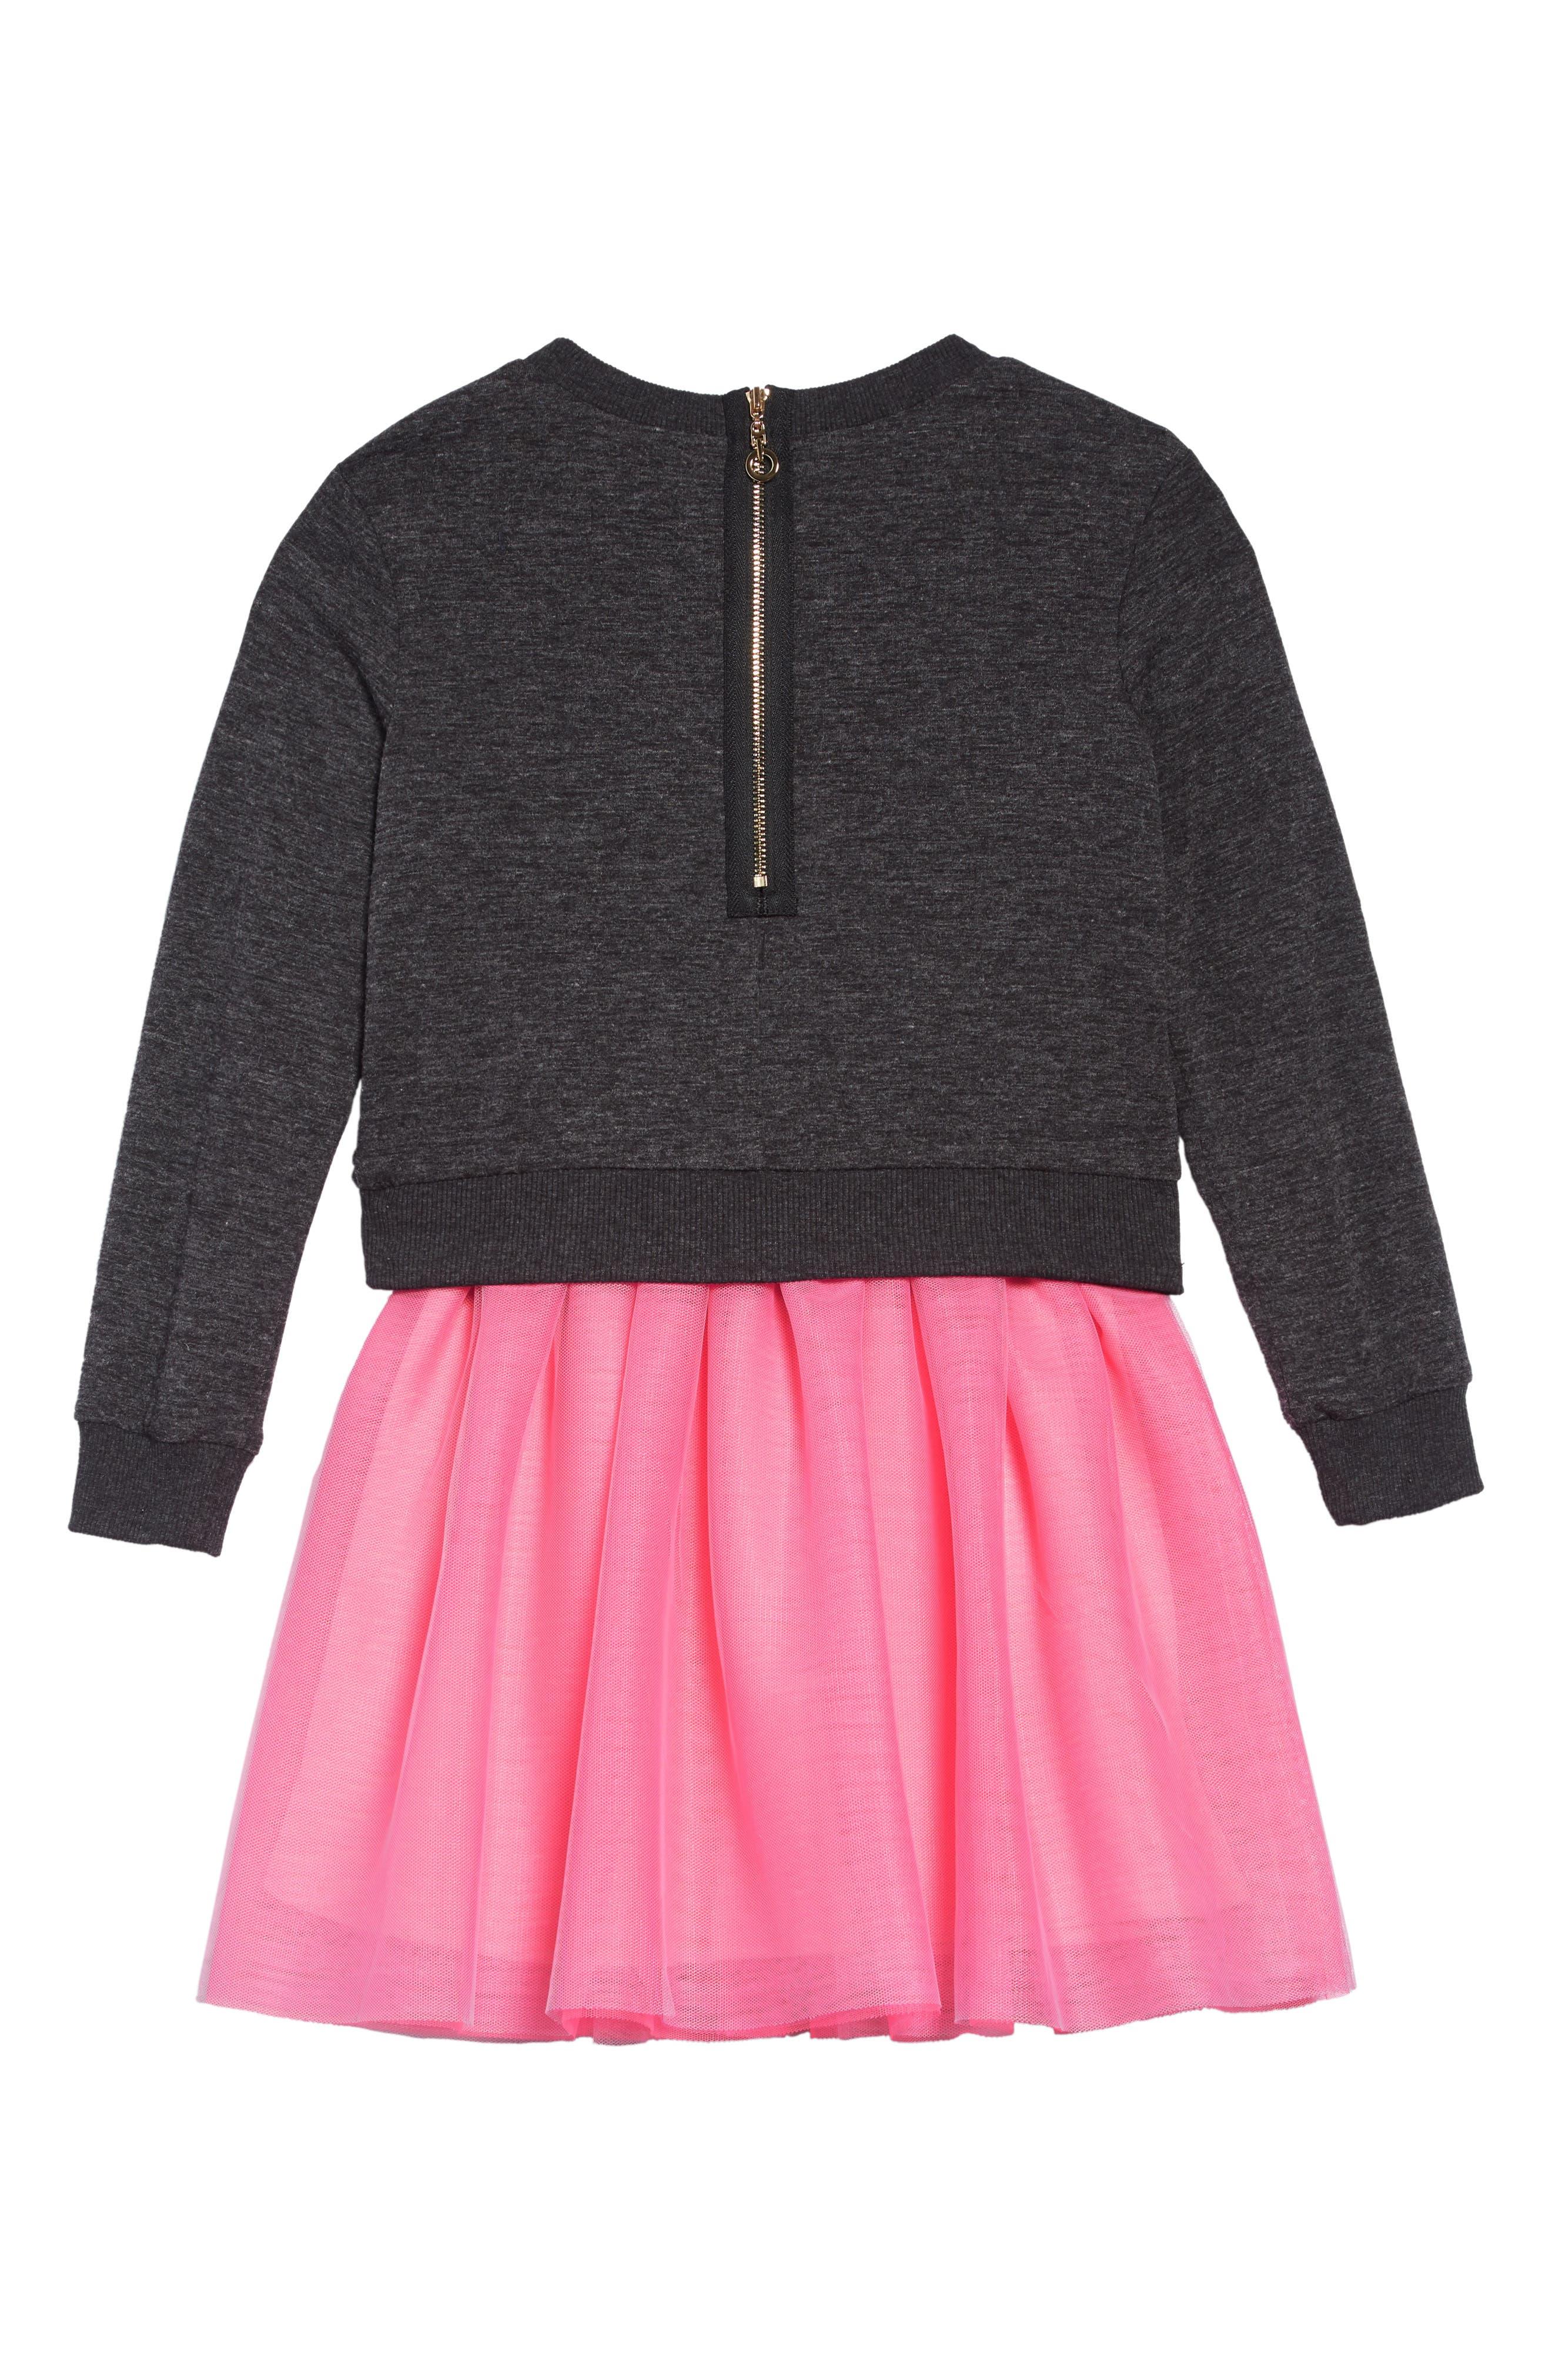 TRULY ME,                             Love Dress Set,                             Alternate thumbnail 2, color,                             GREY PINK